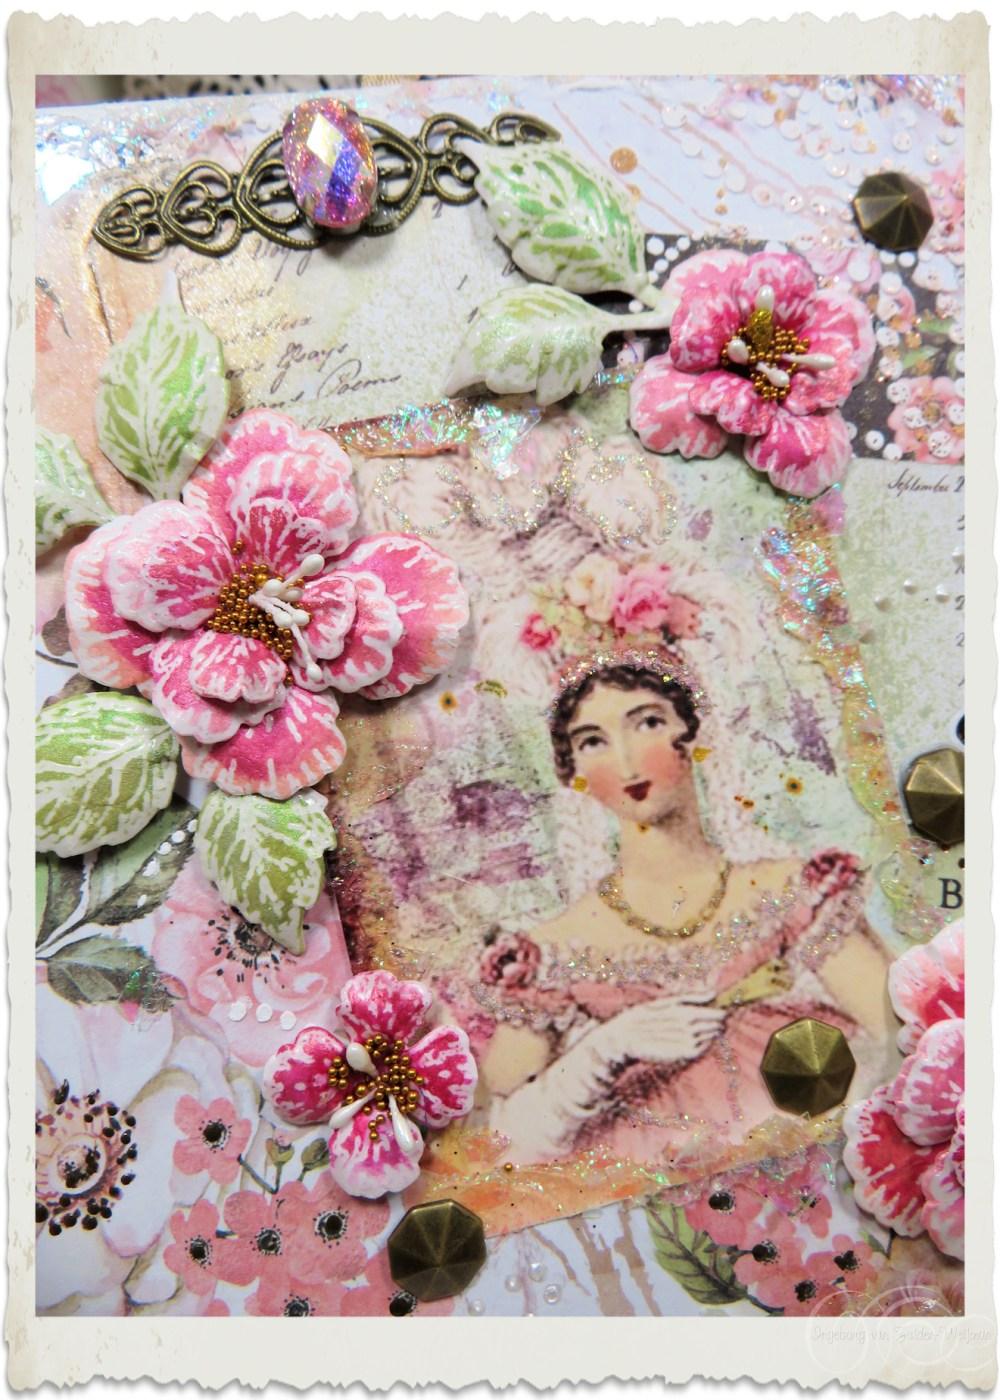 Oakberry lane flowers in pink by Ingeborg van Zuiden